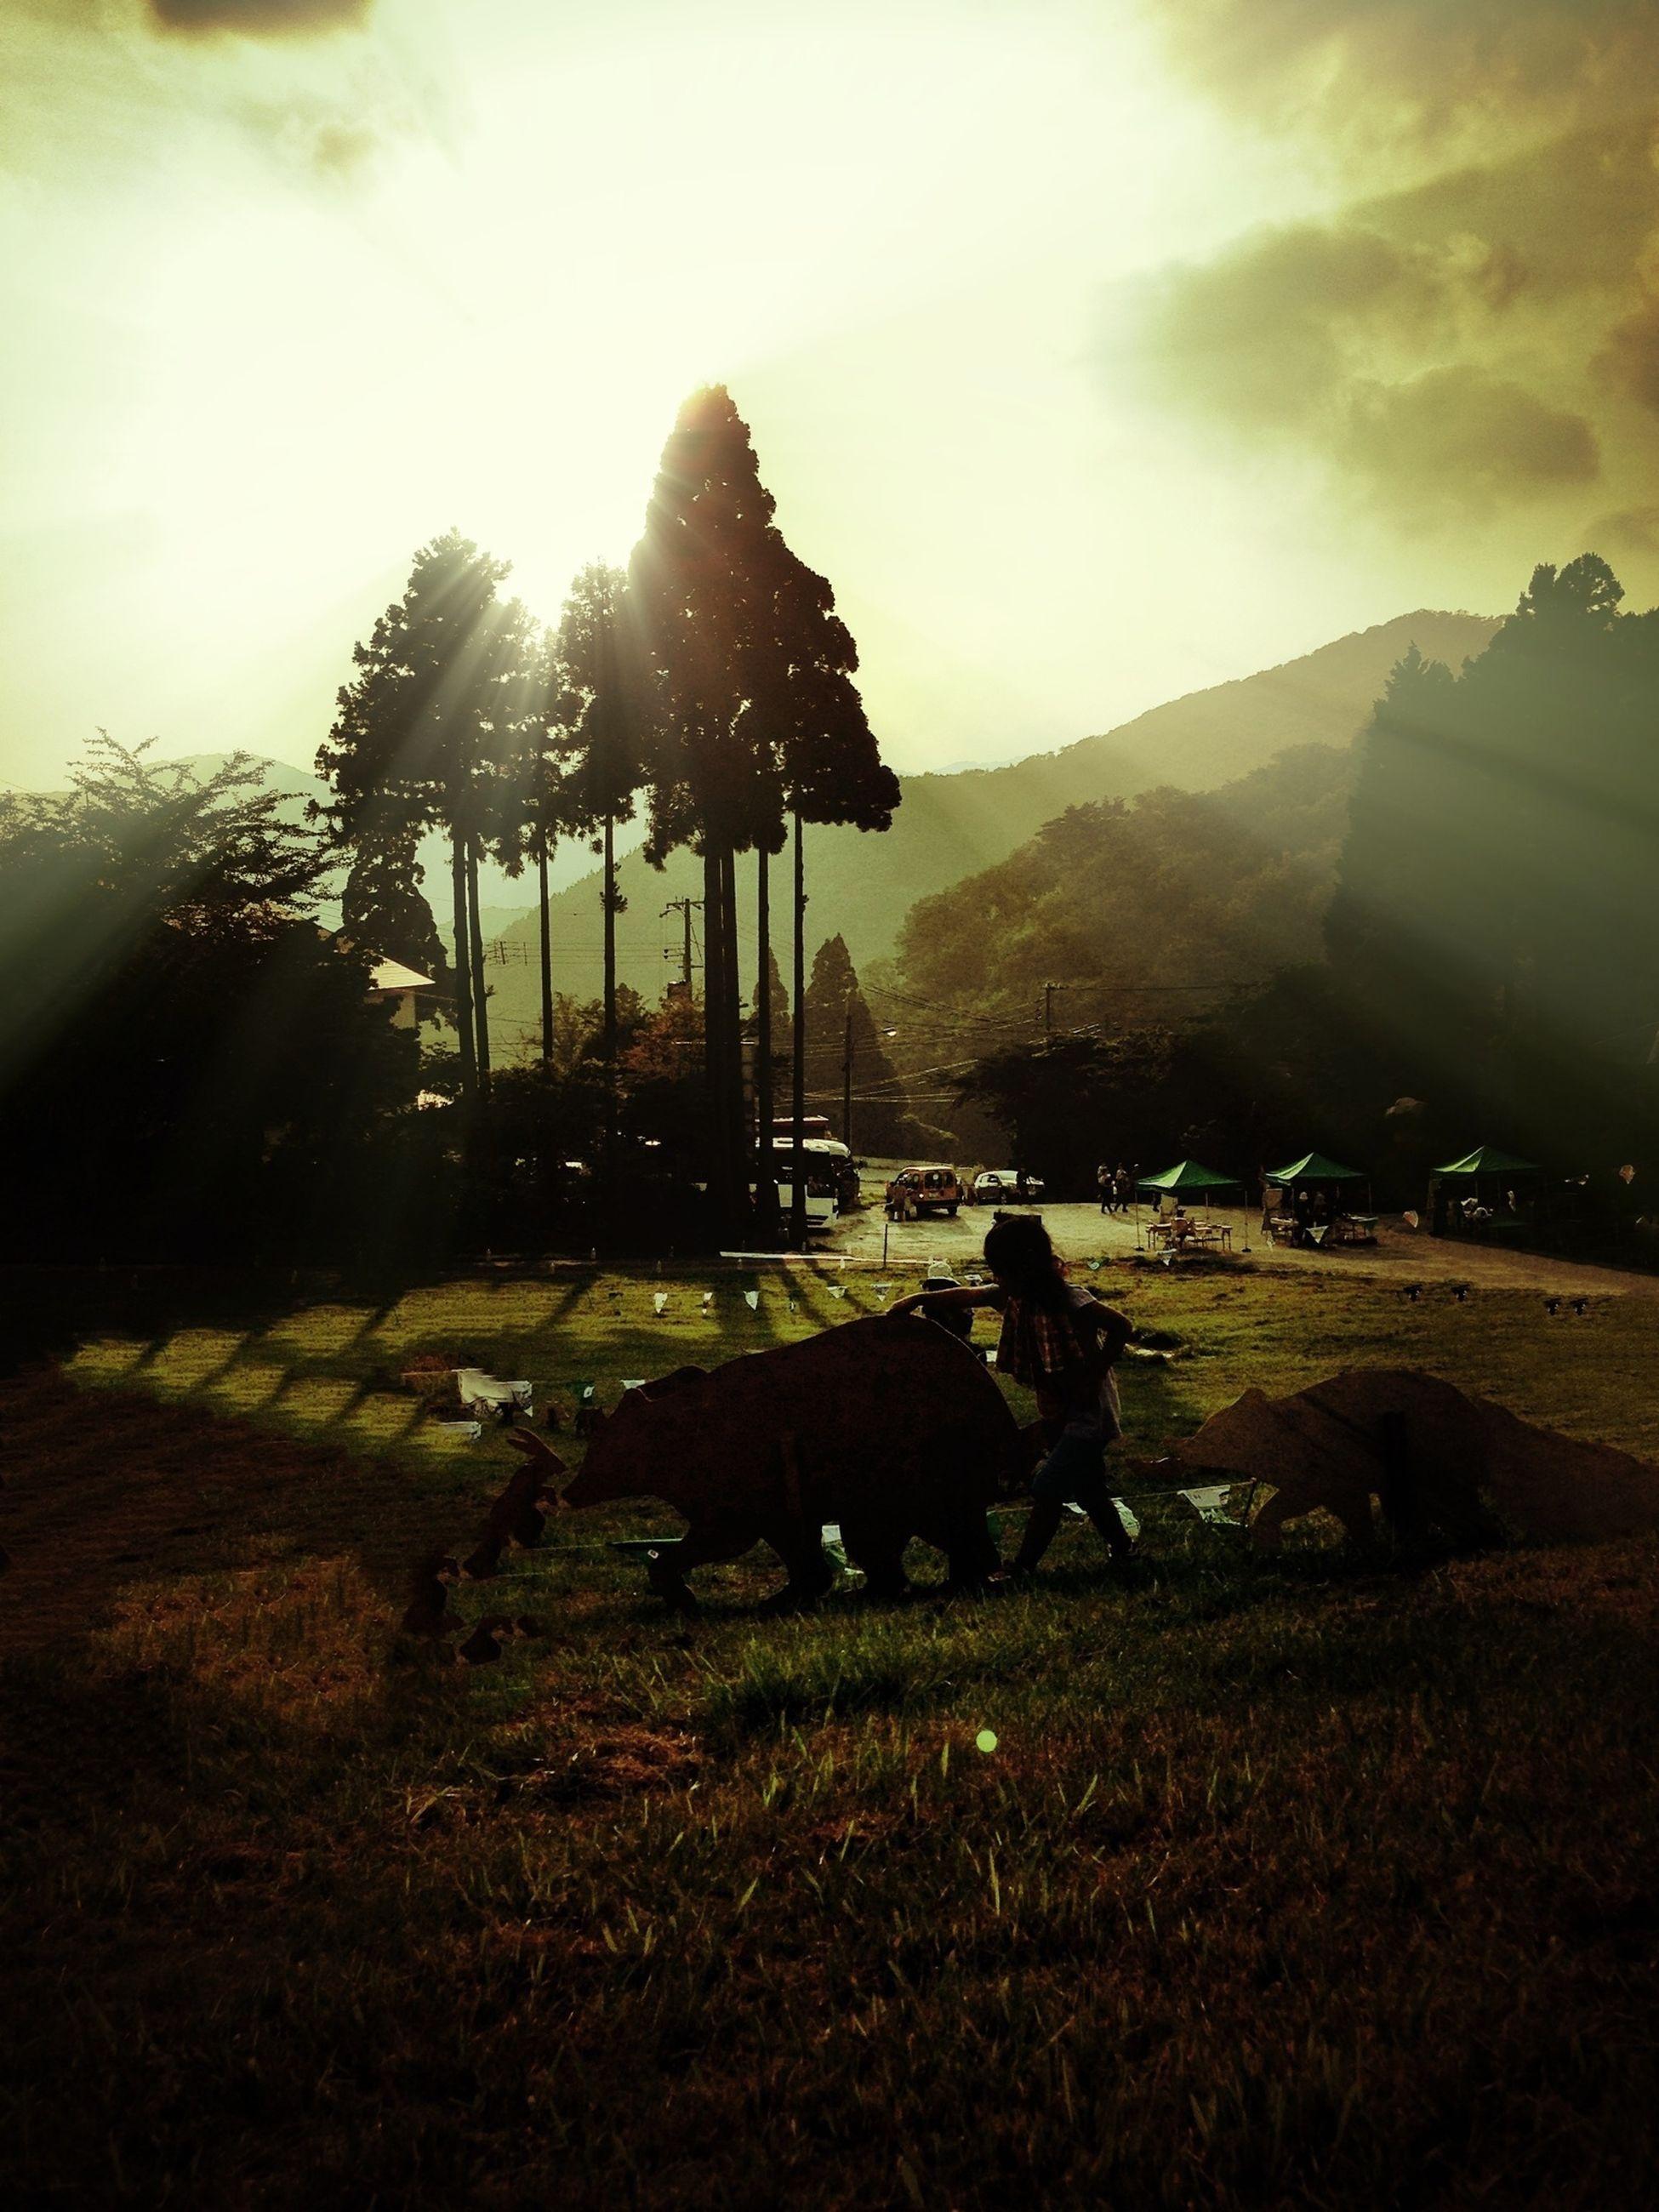 sky, grass, tree, field, sun, landscape, domestic animals, sunlight, mammal, pets, lens flare, cloud - sky, sunbeam, sitting, tranquility, nature, silhouette, grassy, dog, animal themes